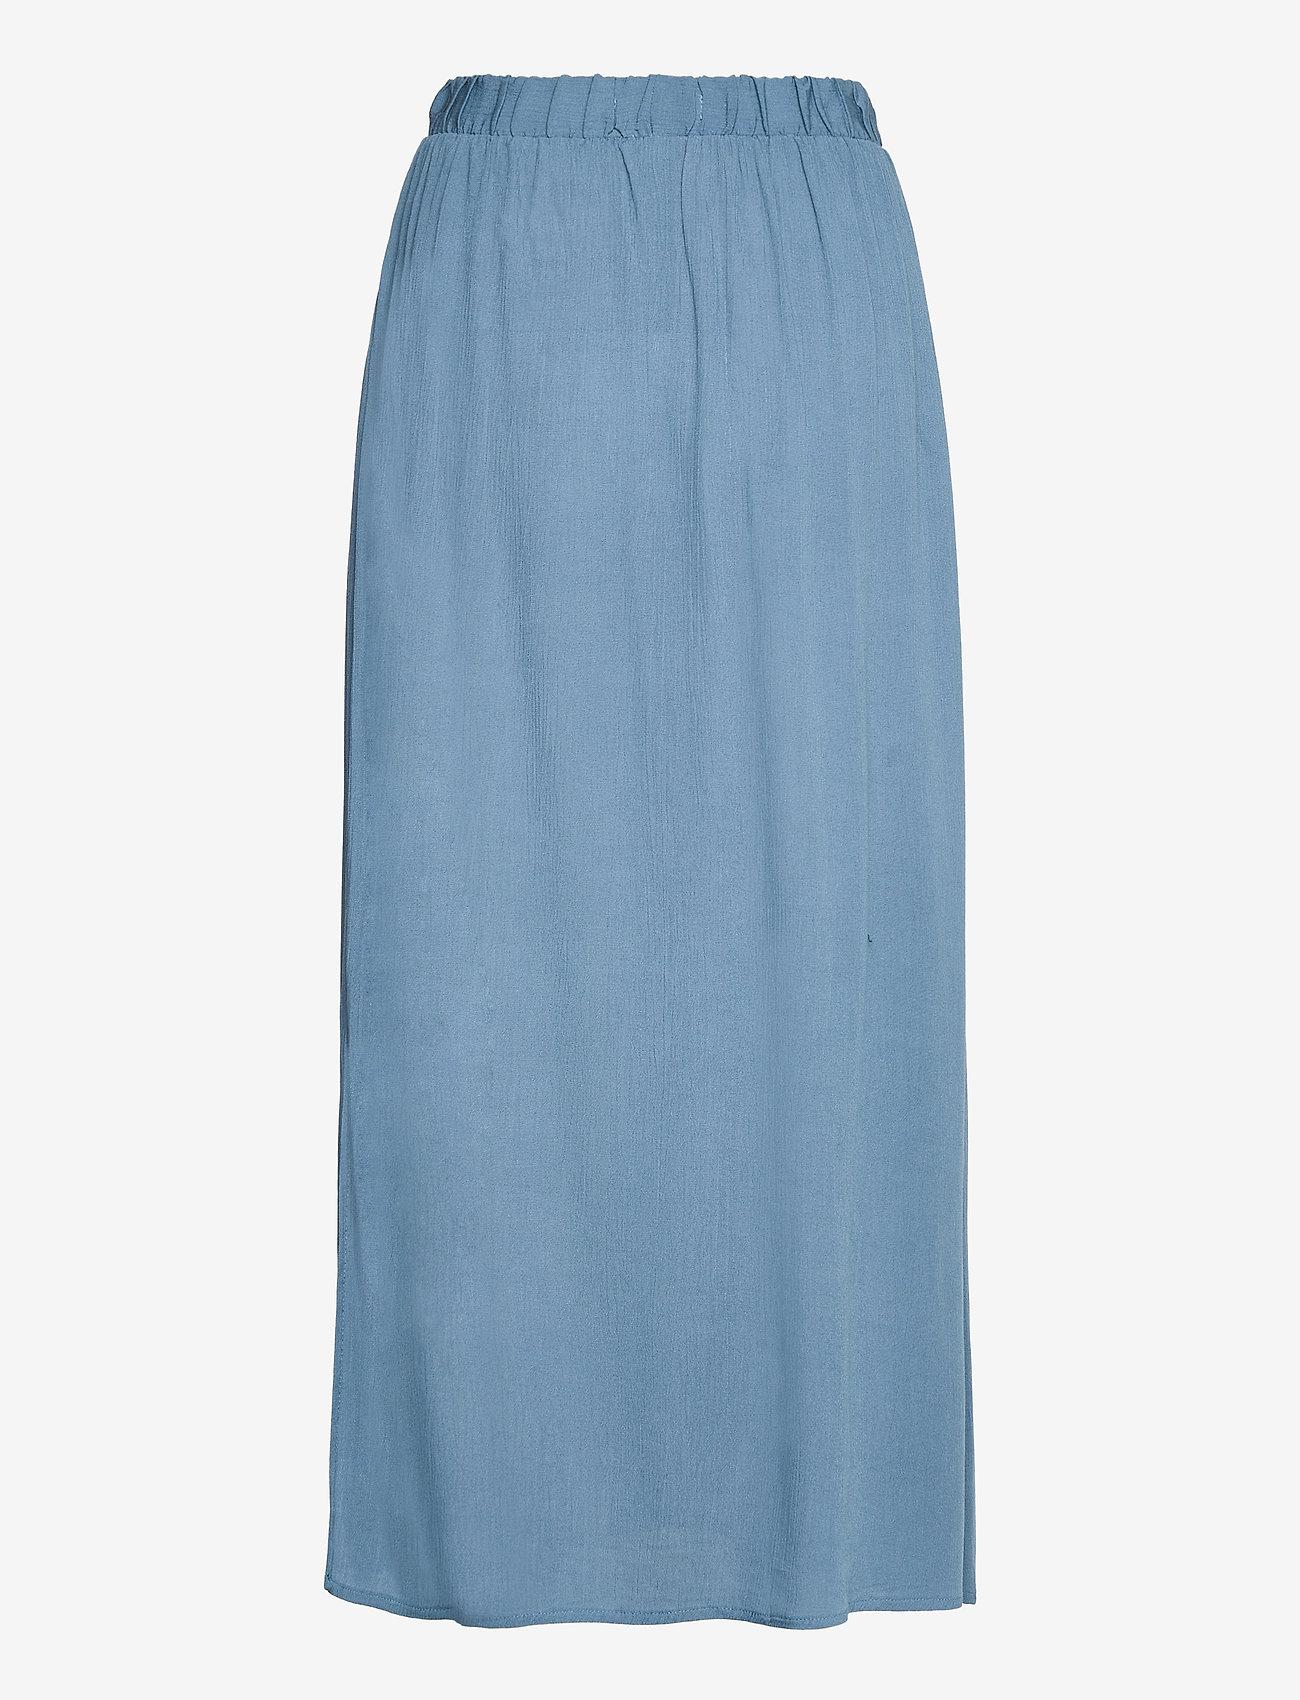 ICHI - IHMARRAKECH SO SK3 - midi skirts - coronet blue - 1